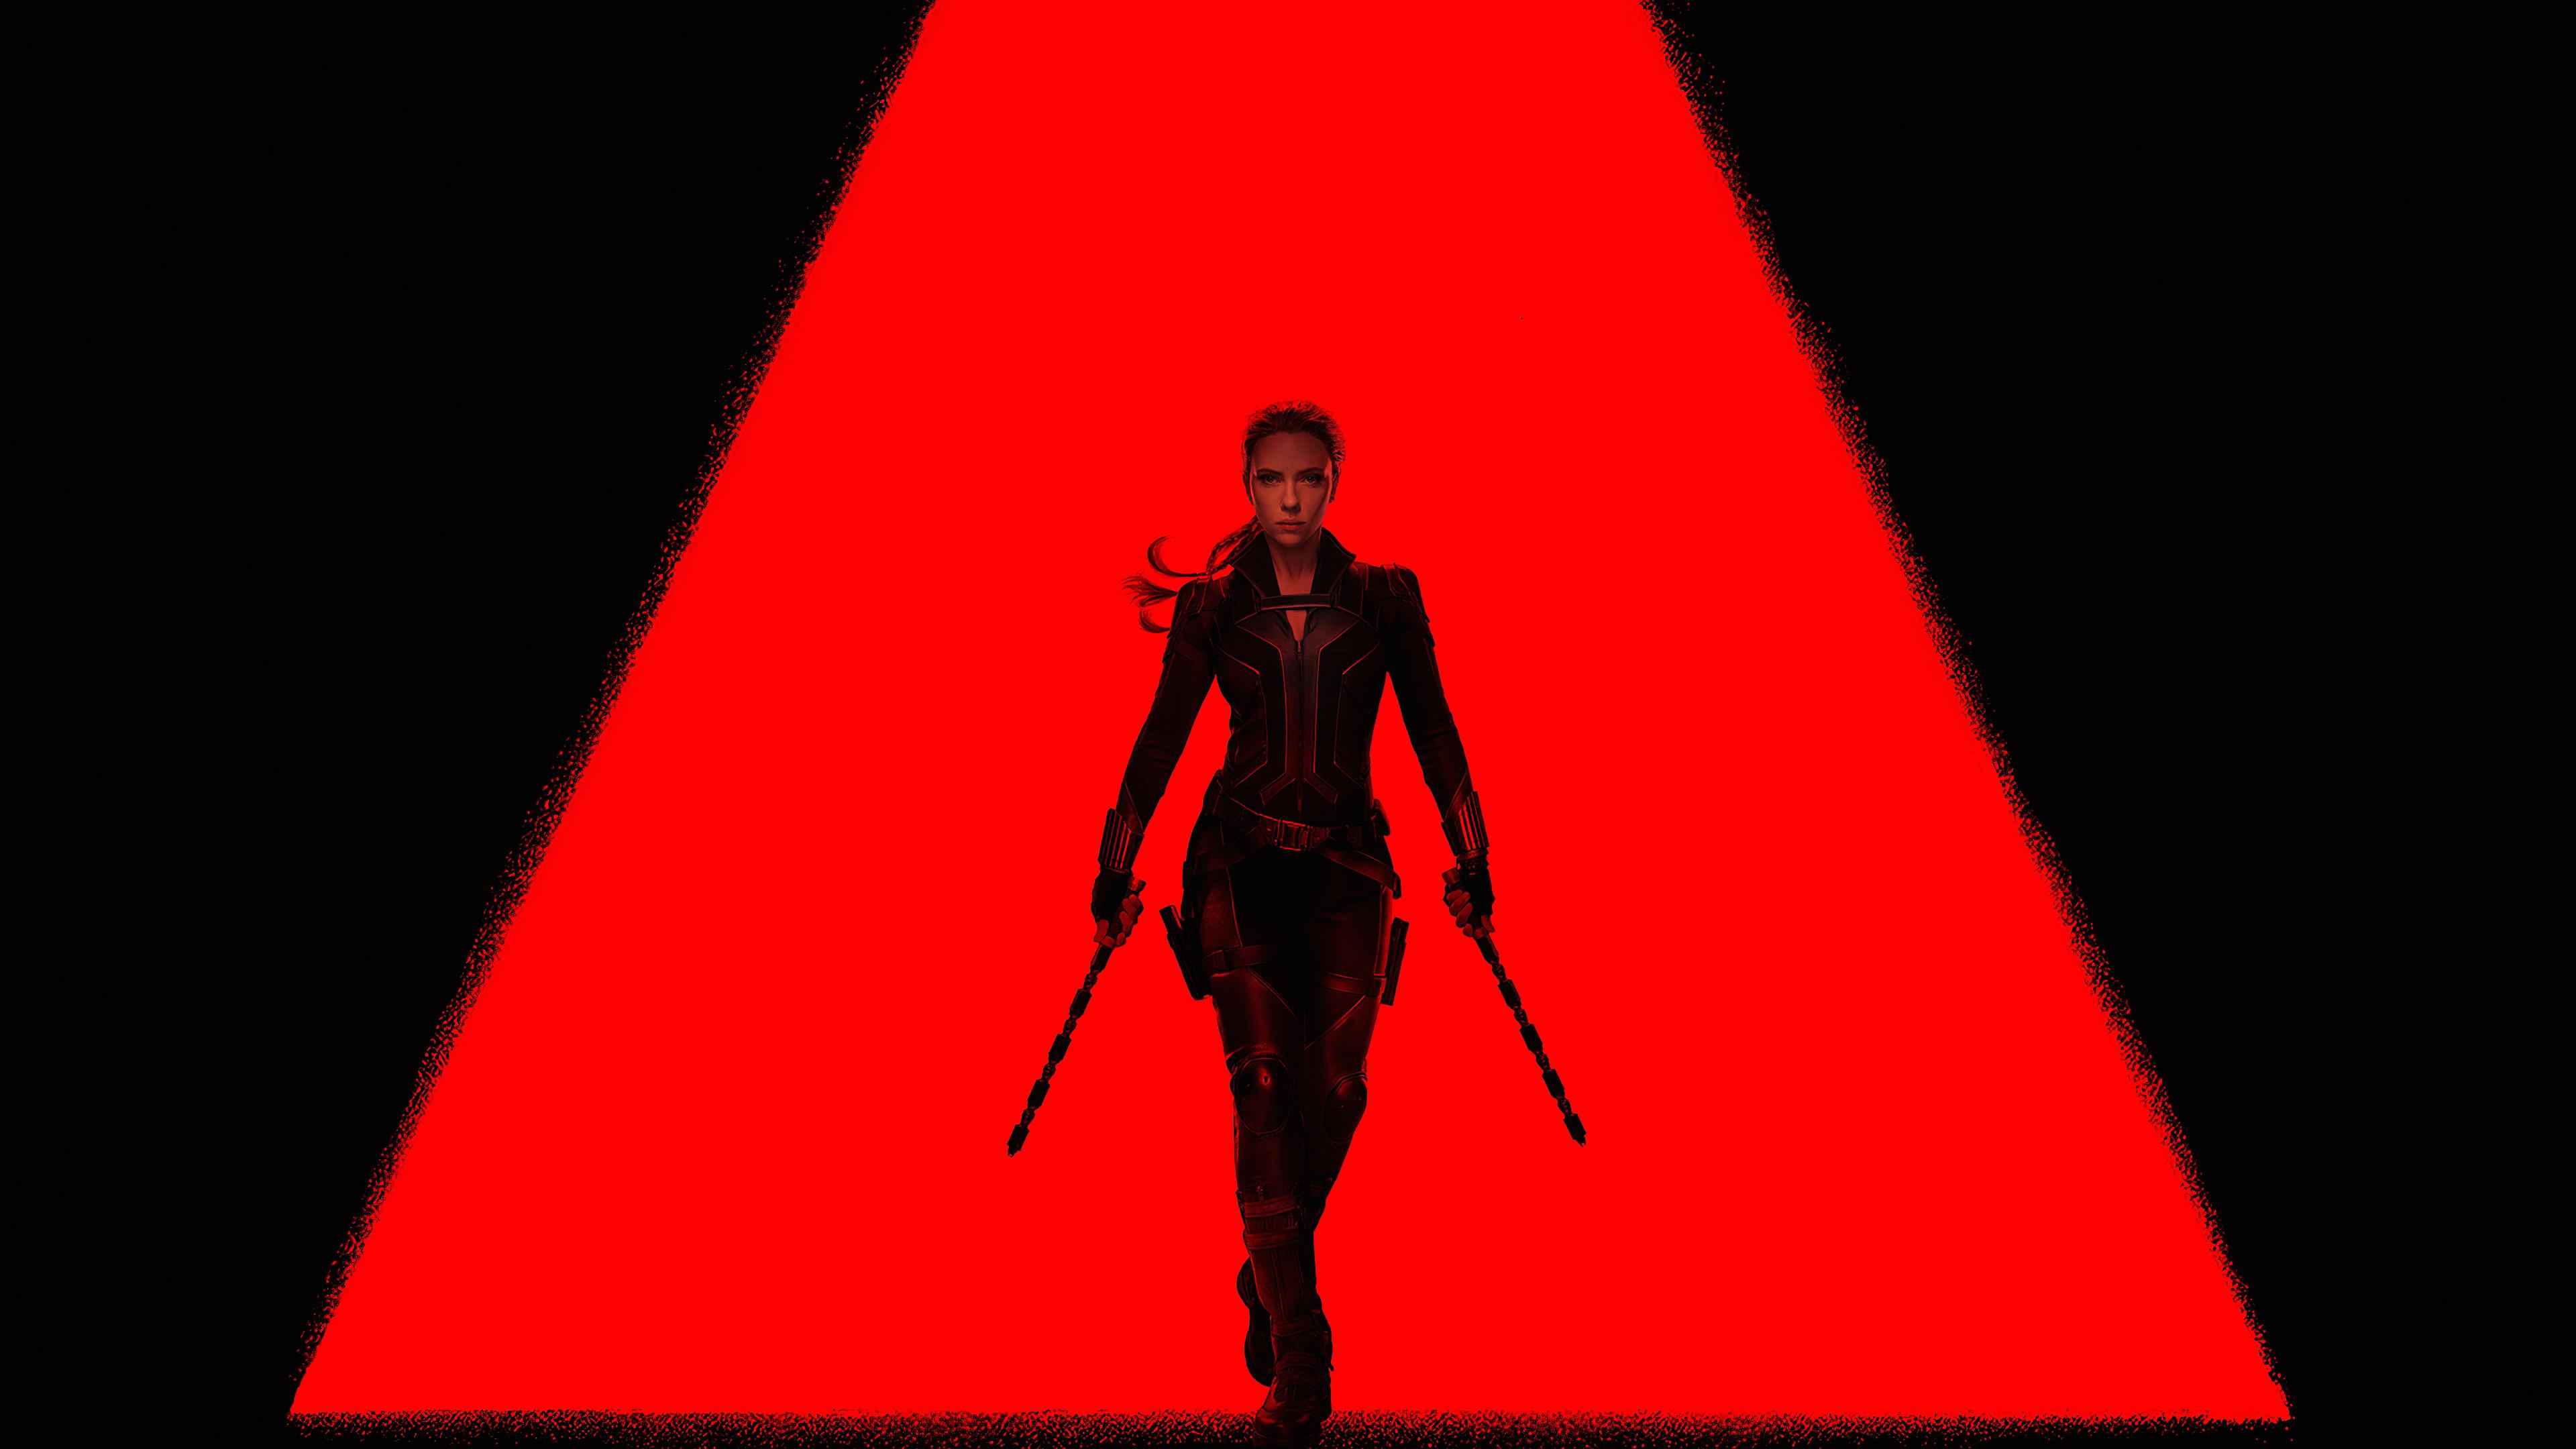 black widow movie red theme 1576584636 - Black Widow Movie Red Theme - black widow red wallpaper 4k, Black Widow Movie Red Theme 4k wallpaper, 4k black widows wallpaper